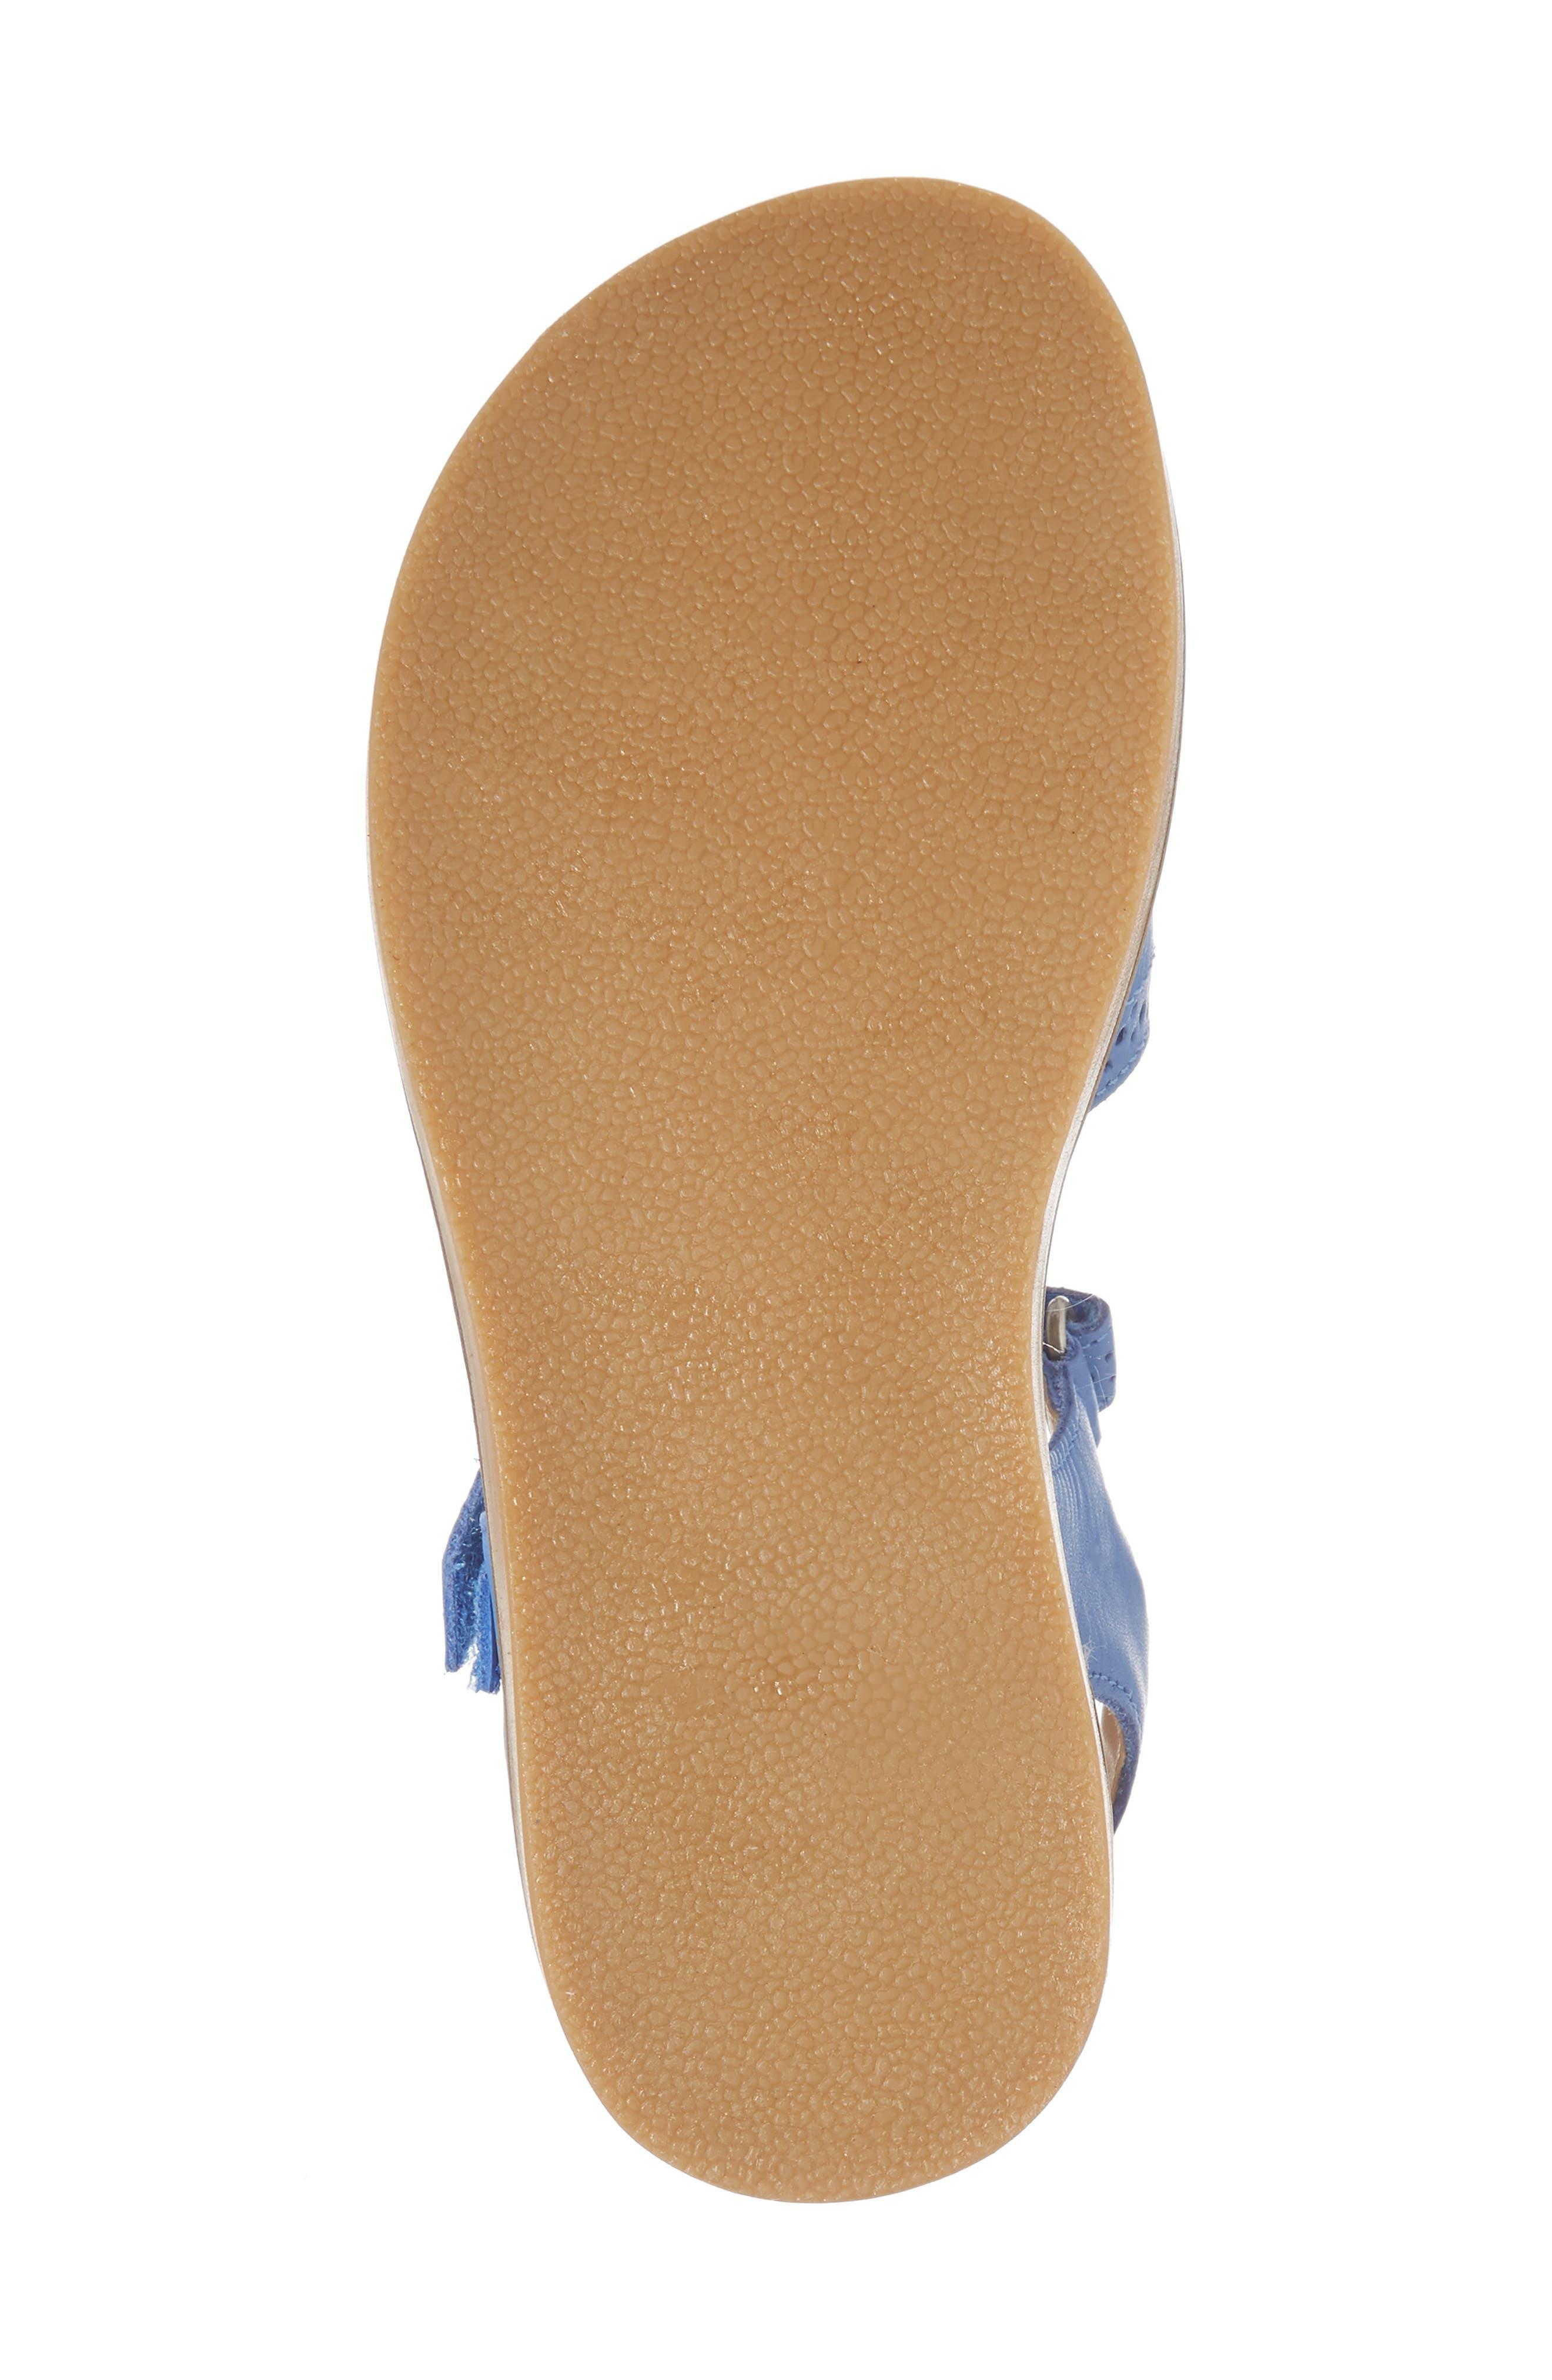 Adjustable Quarter Strap Sandal,                             Alternate thumbnail 6, color,                             Penzance Blue